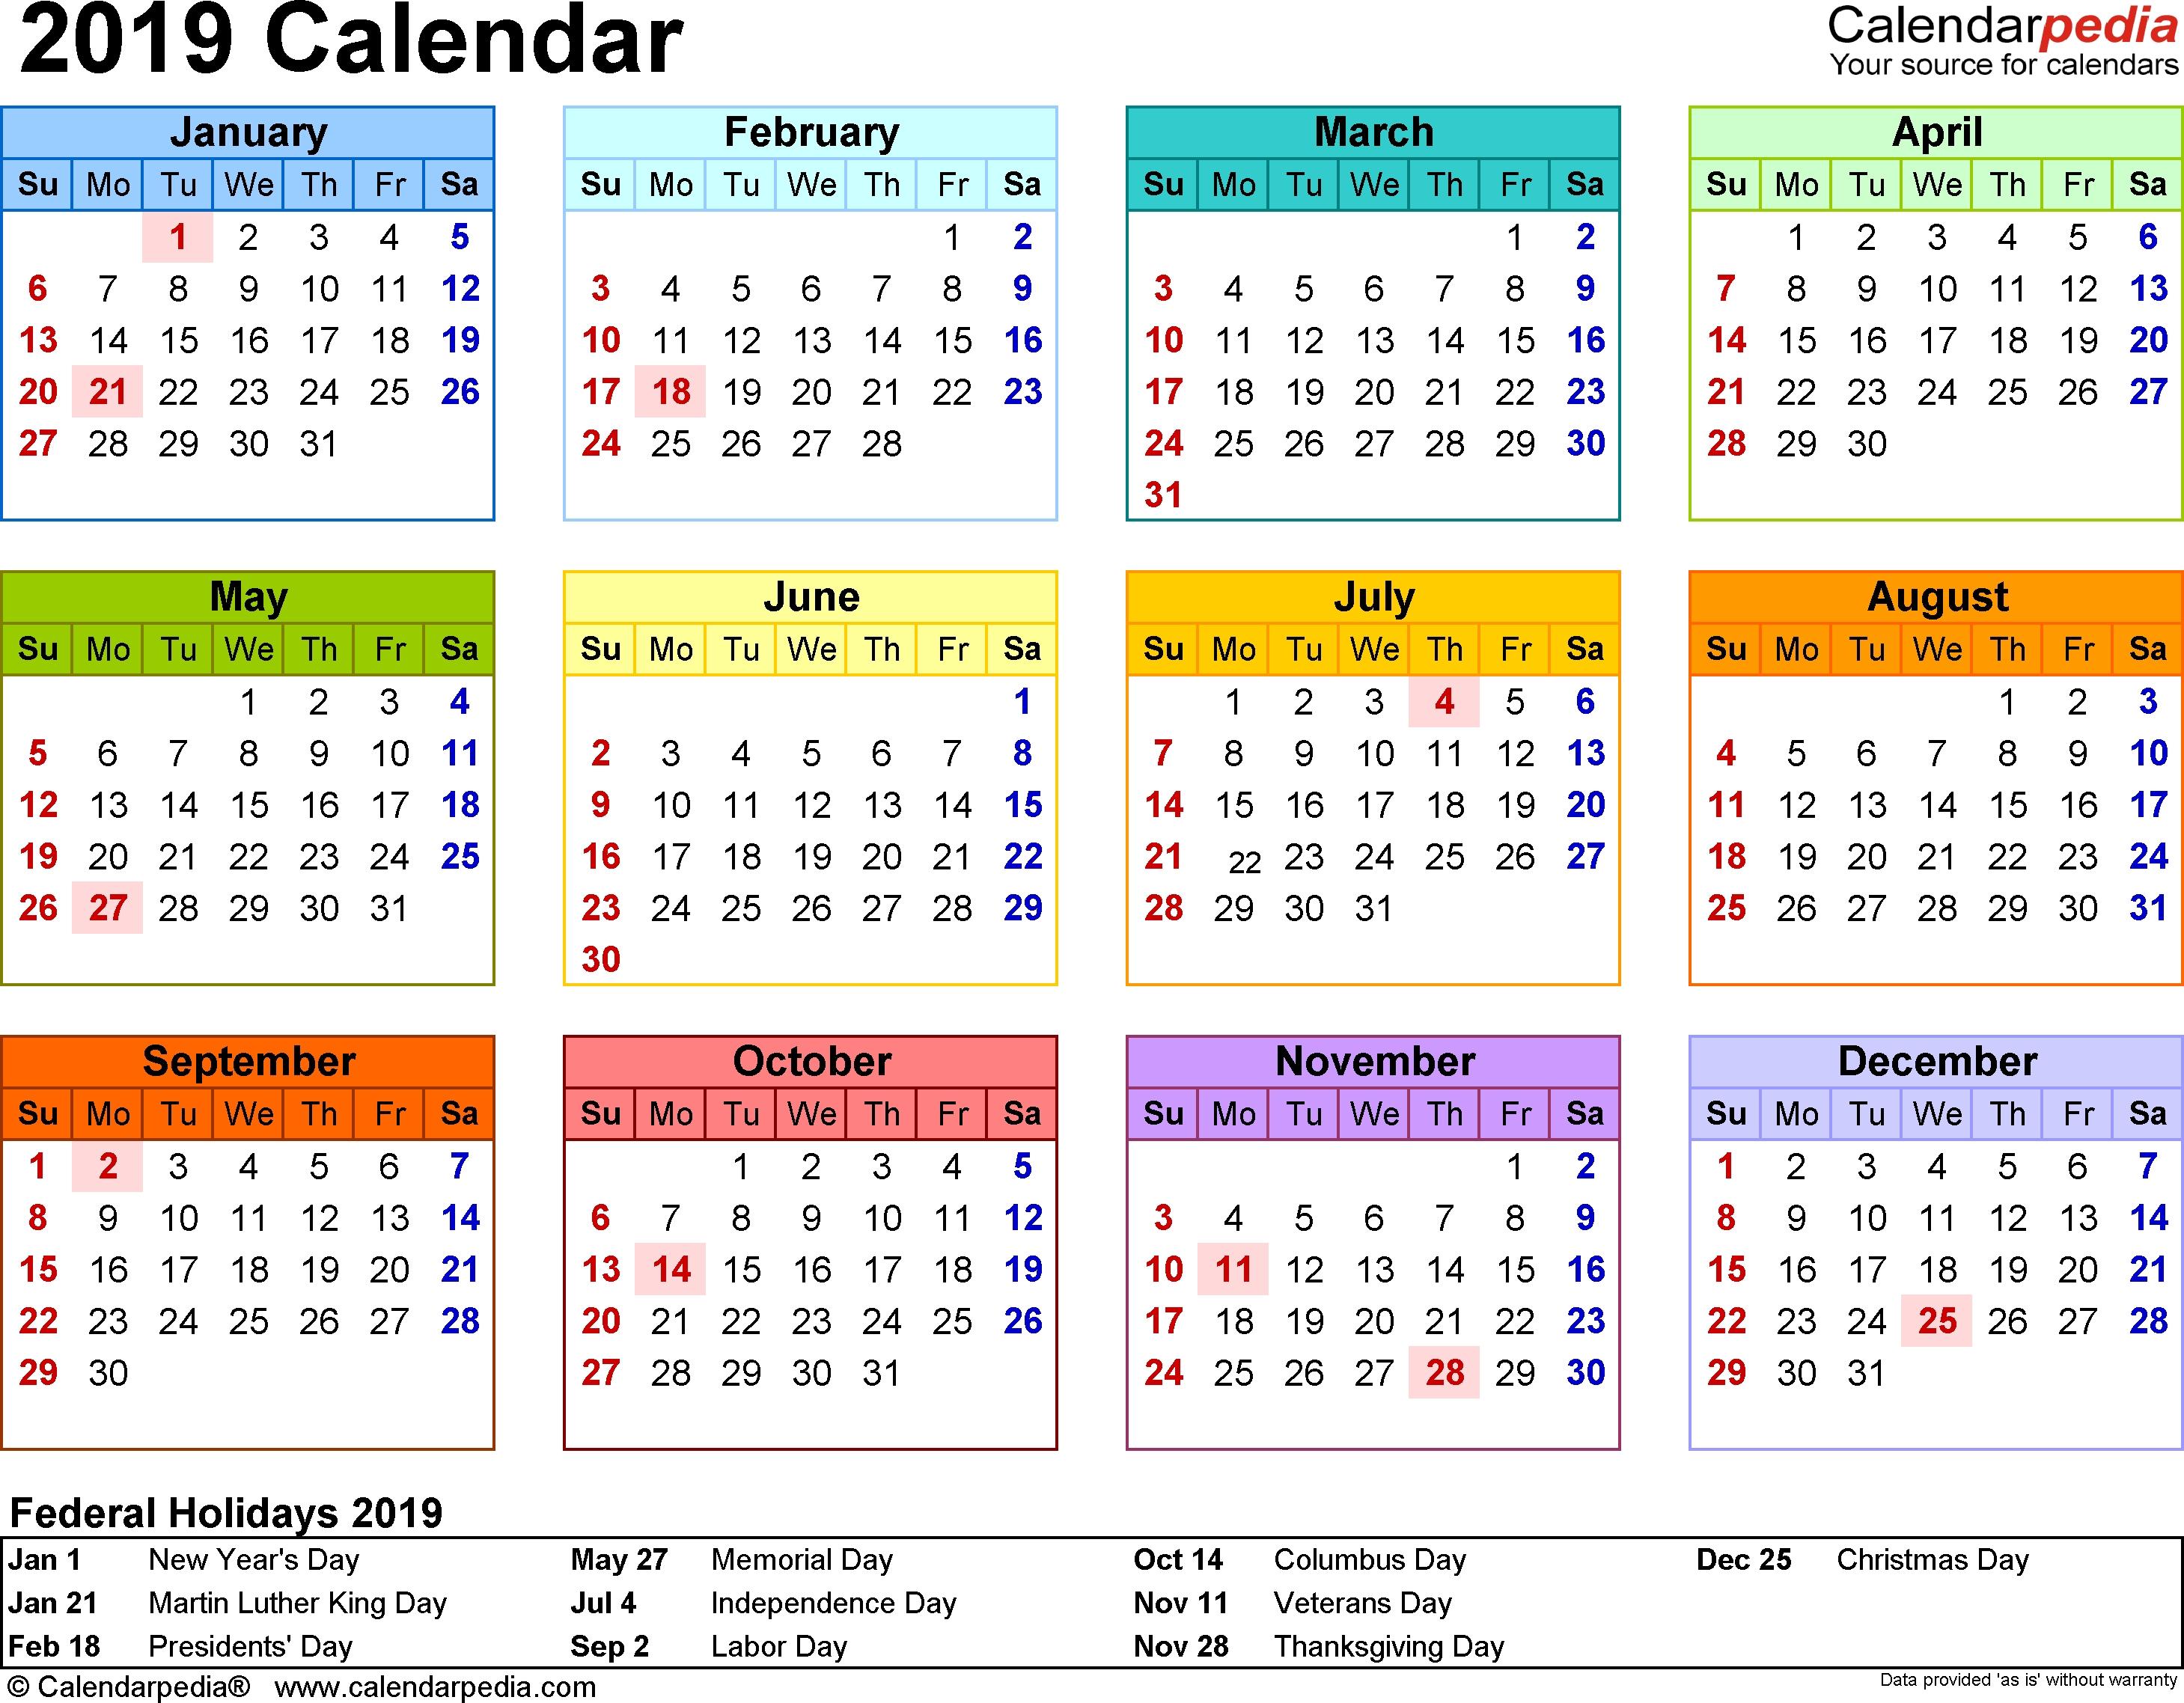 2019 Calendar Pdf - 18 Free Printable Calendar Templates-Free Printable 4X6 Calendars 2020 Templates